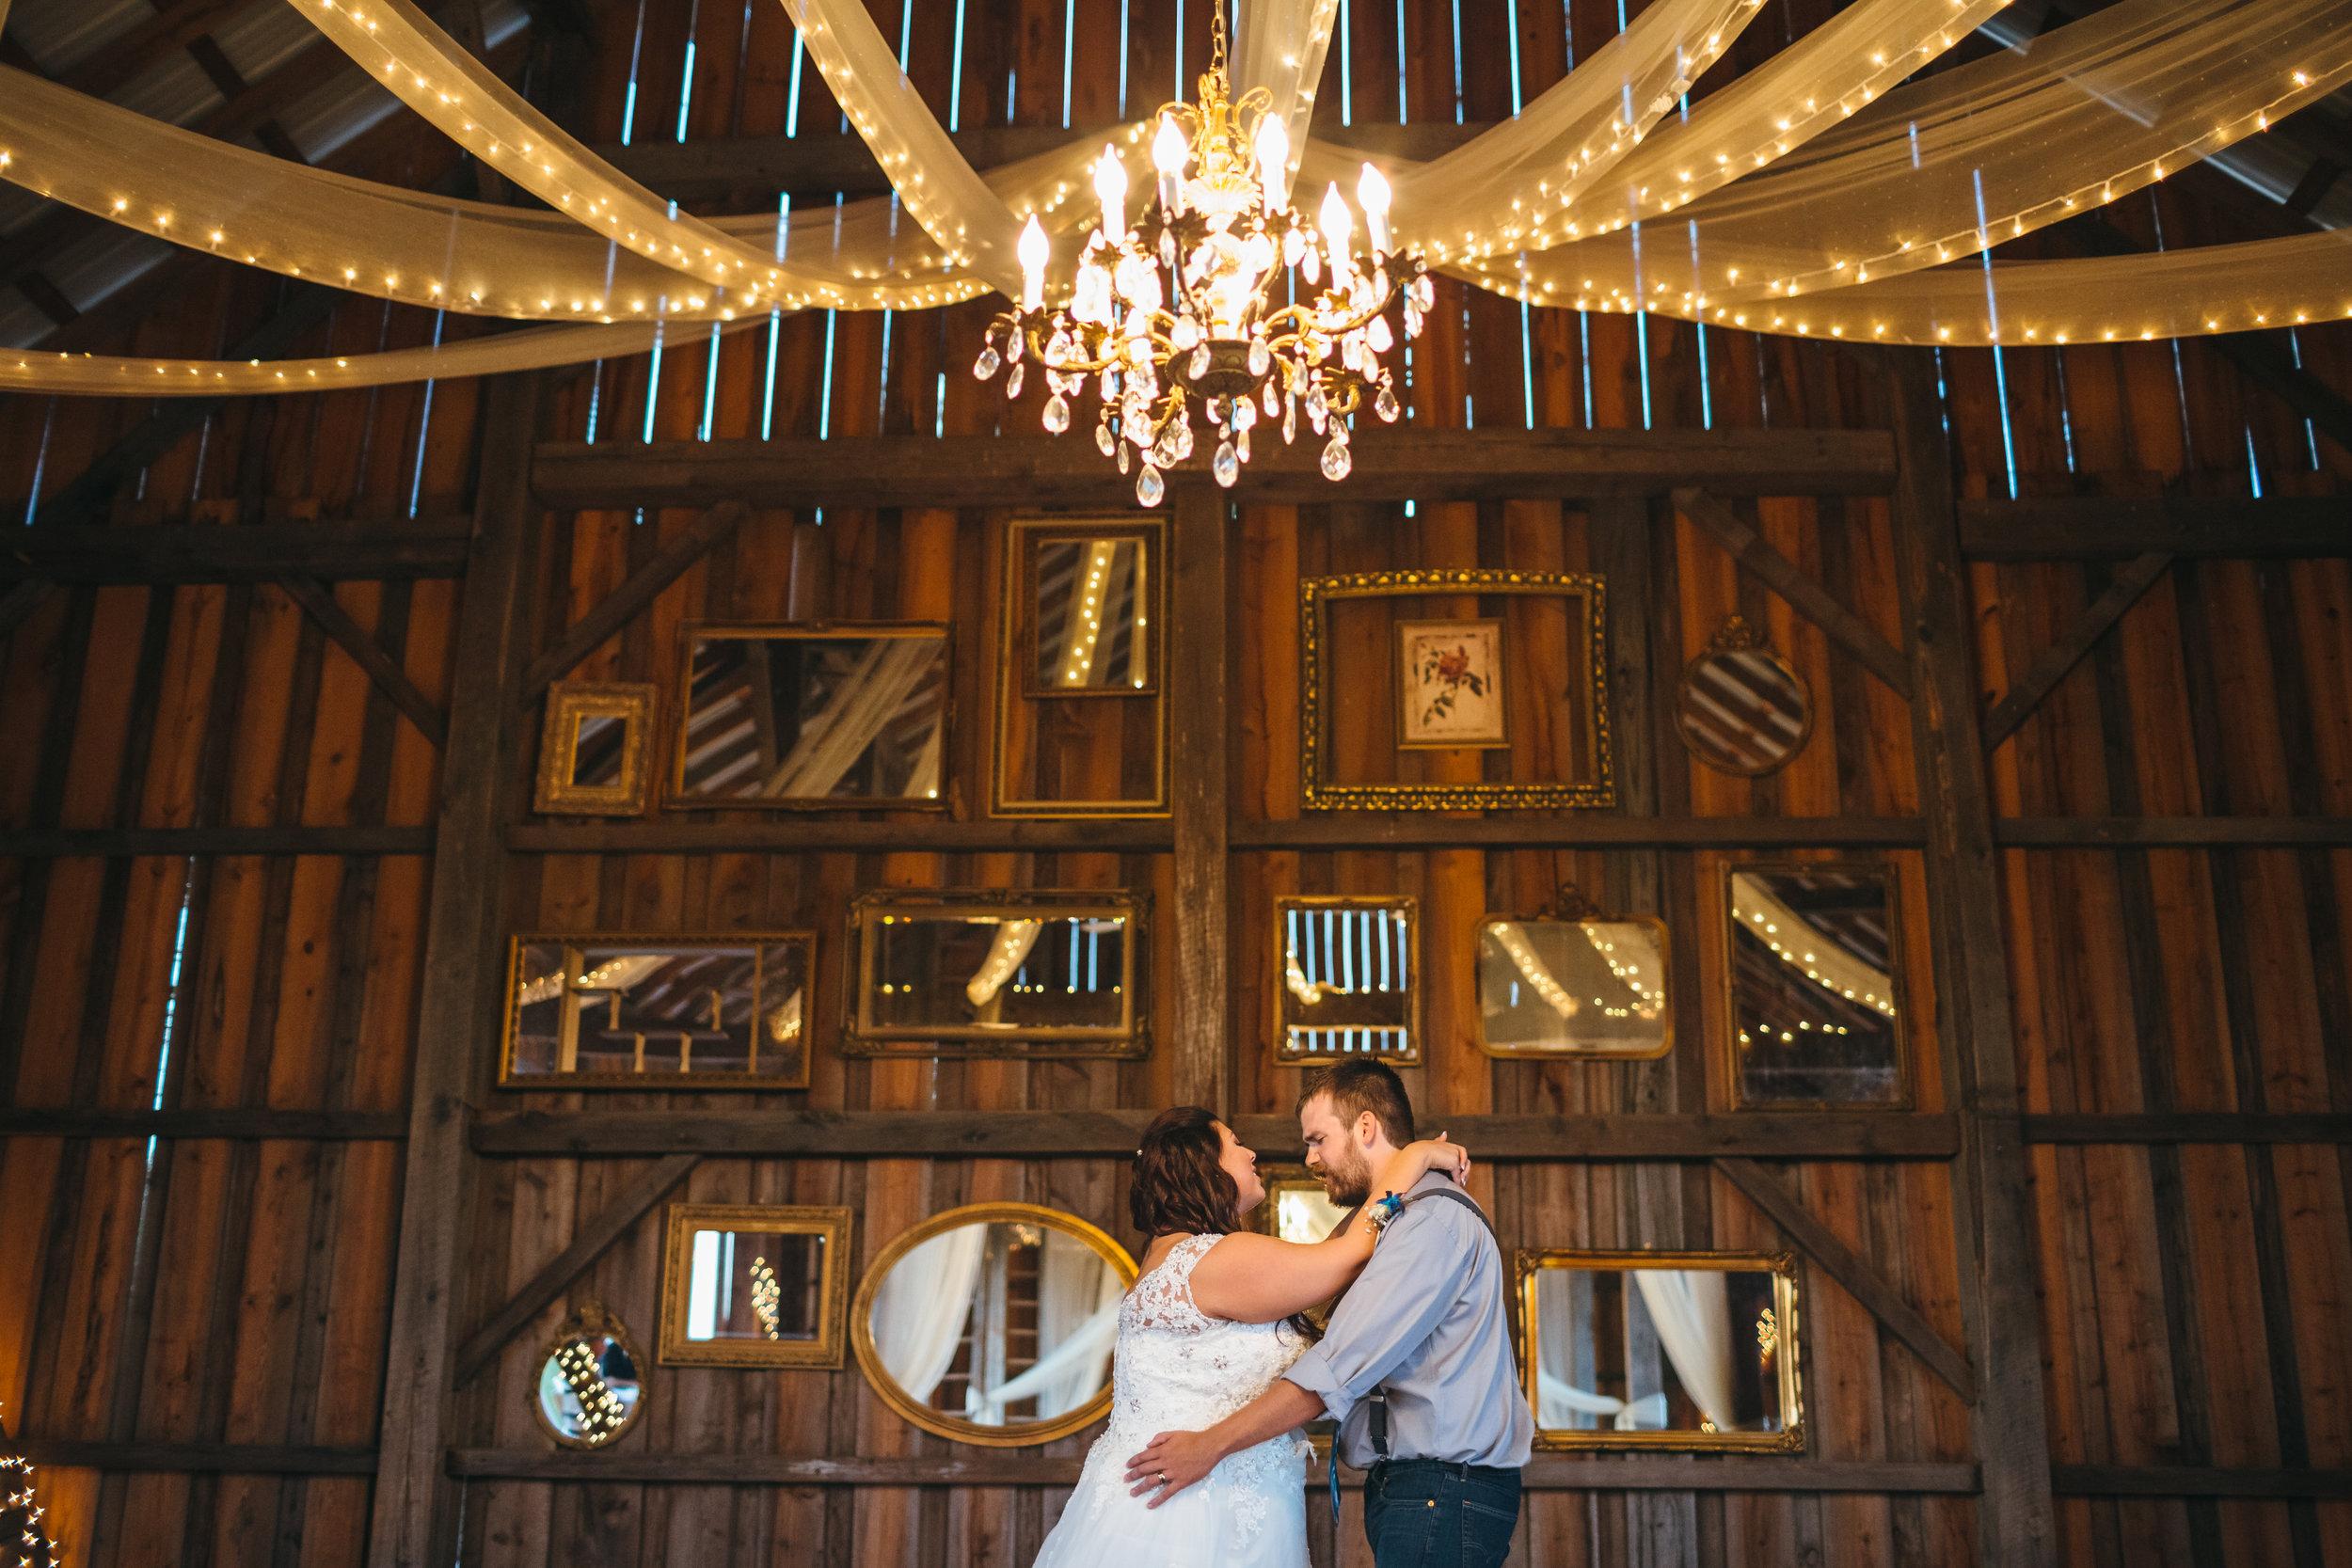 Sorella Farms_Lynchburg Wedding Photographer_Lynchburg Wedding Venue_Lynchburg Photographer-44.jpg